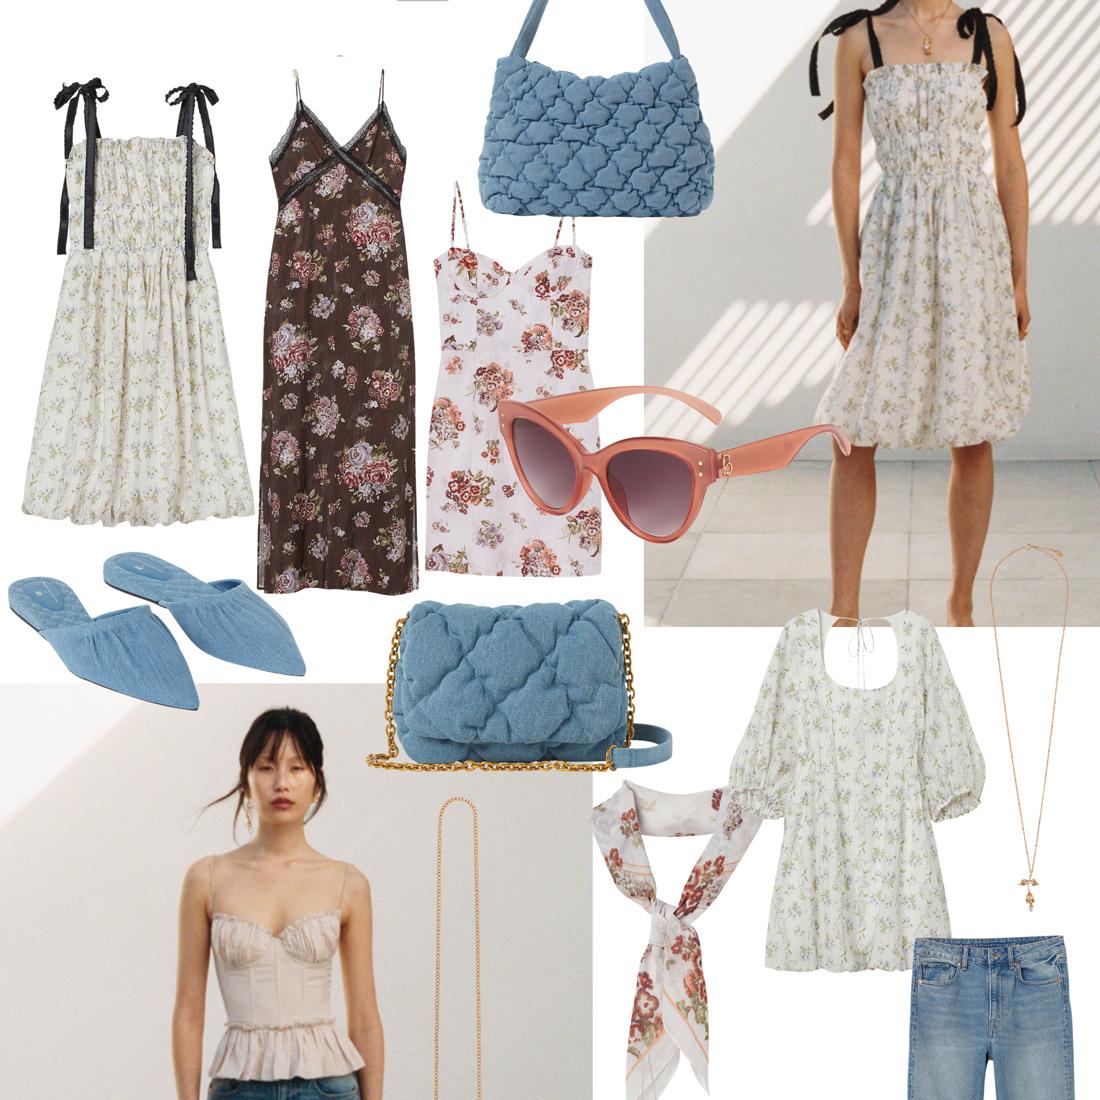 H&M Brock Collection Dress